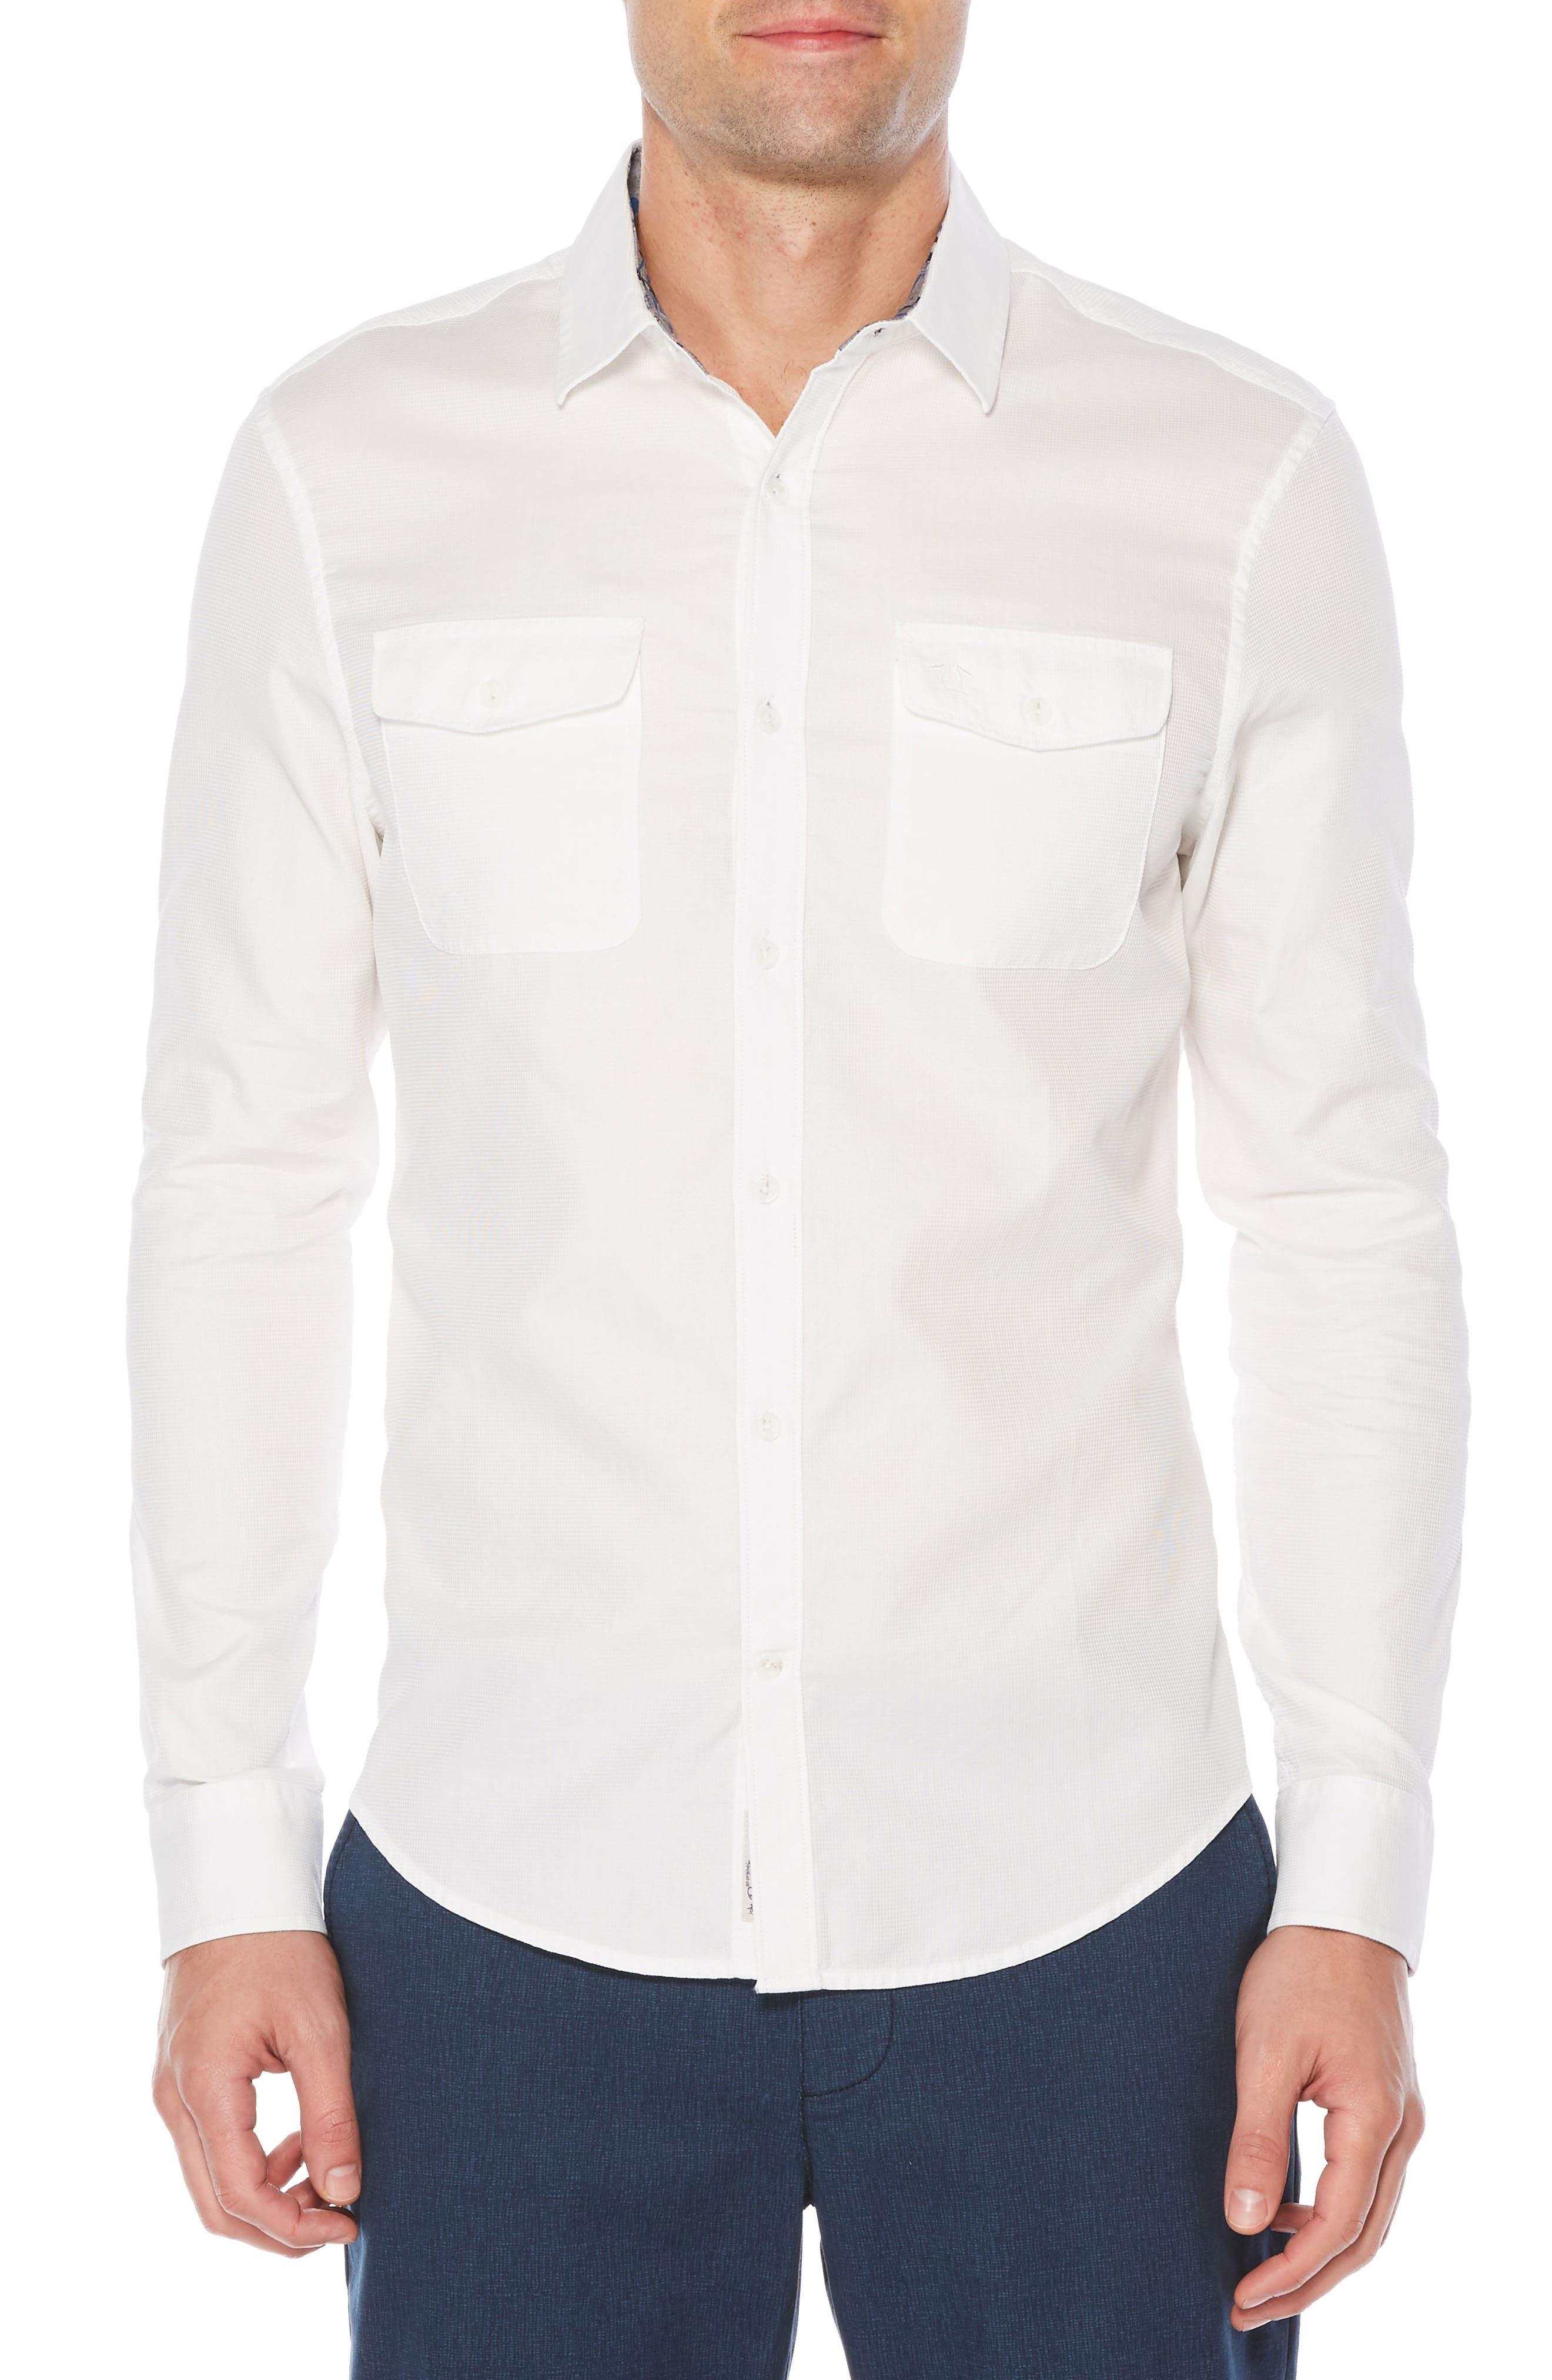 Main Image - Original Penguin Woven Shirt